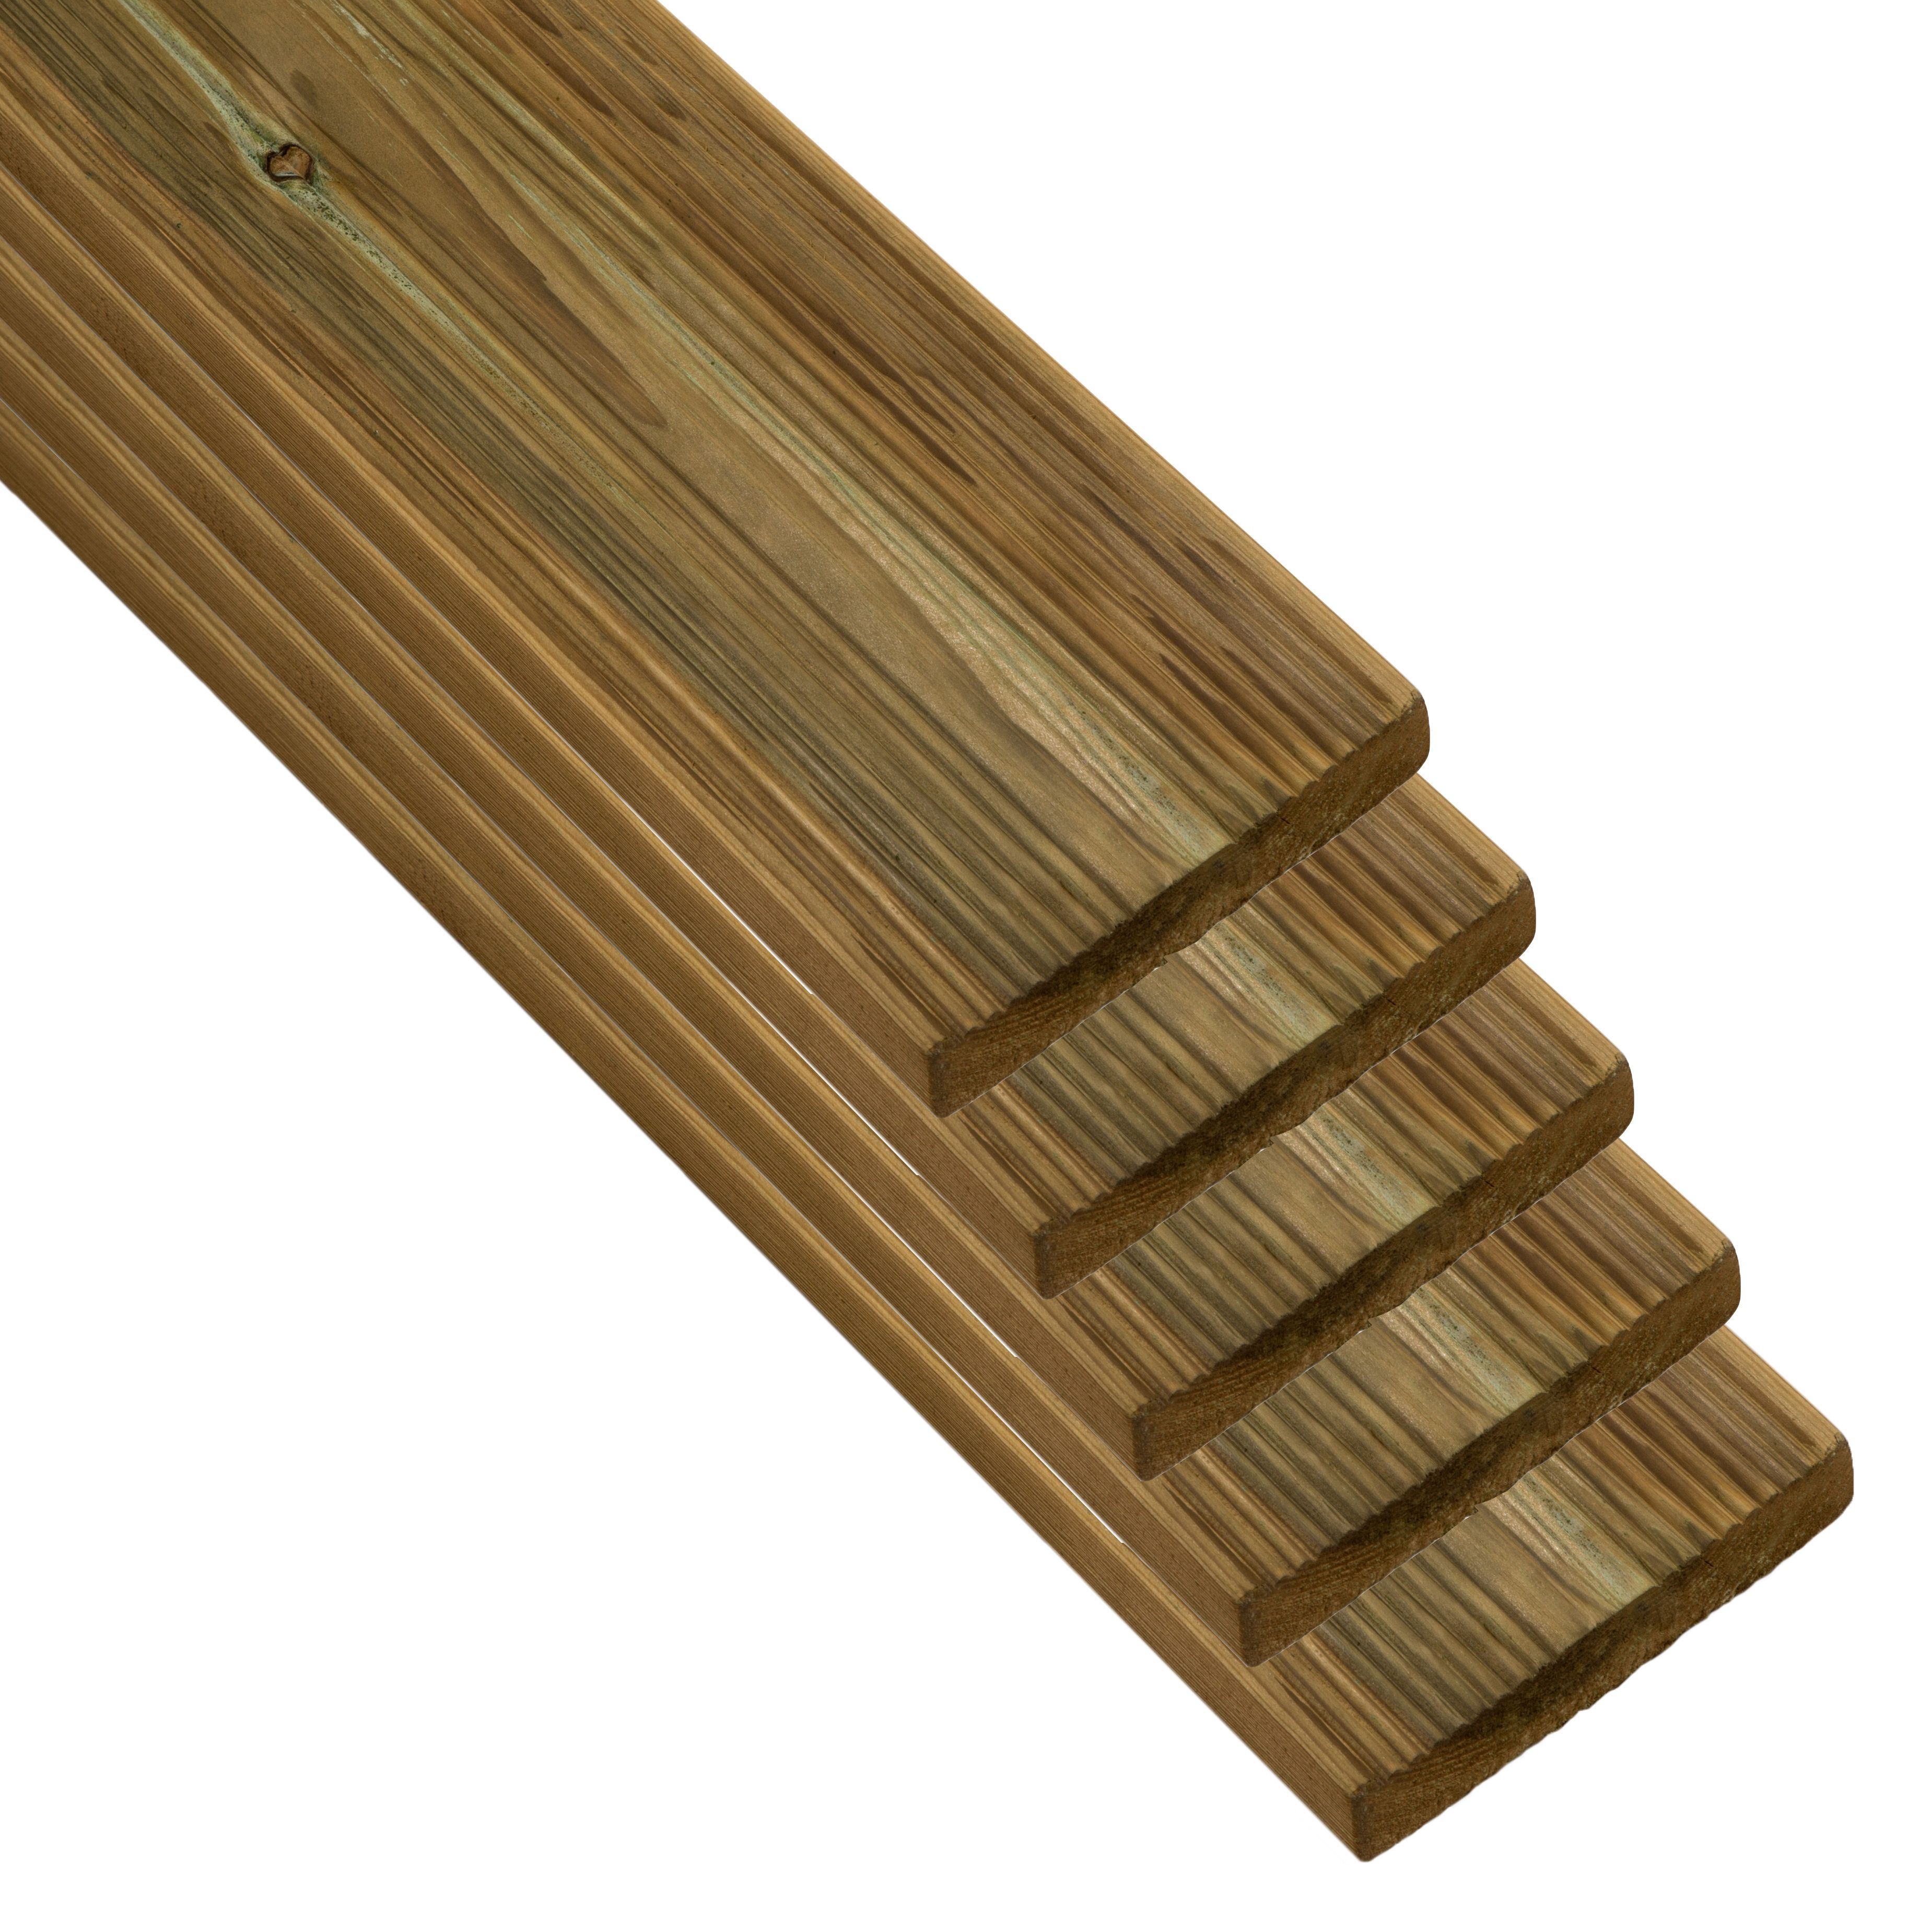 Blooma Nevou Premium Uc4 Deck Board (t)27mm (w)144mm (l)2400mm, Pack Of 5